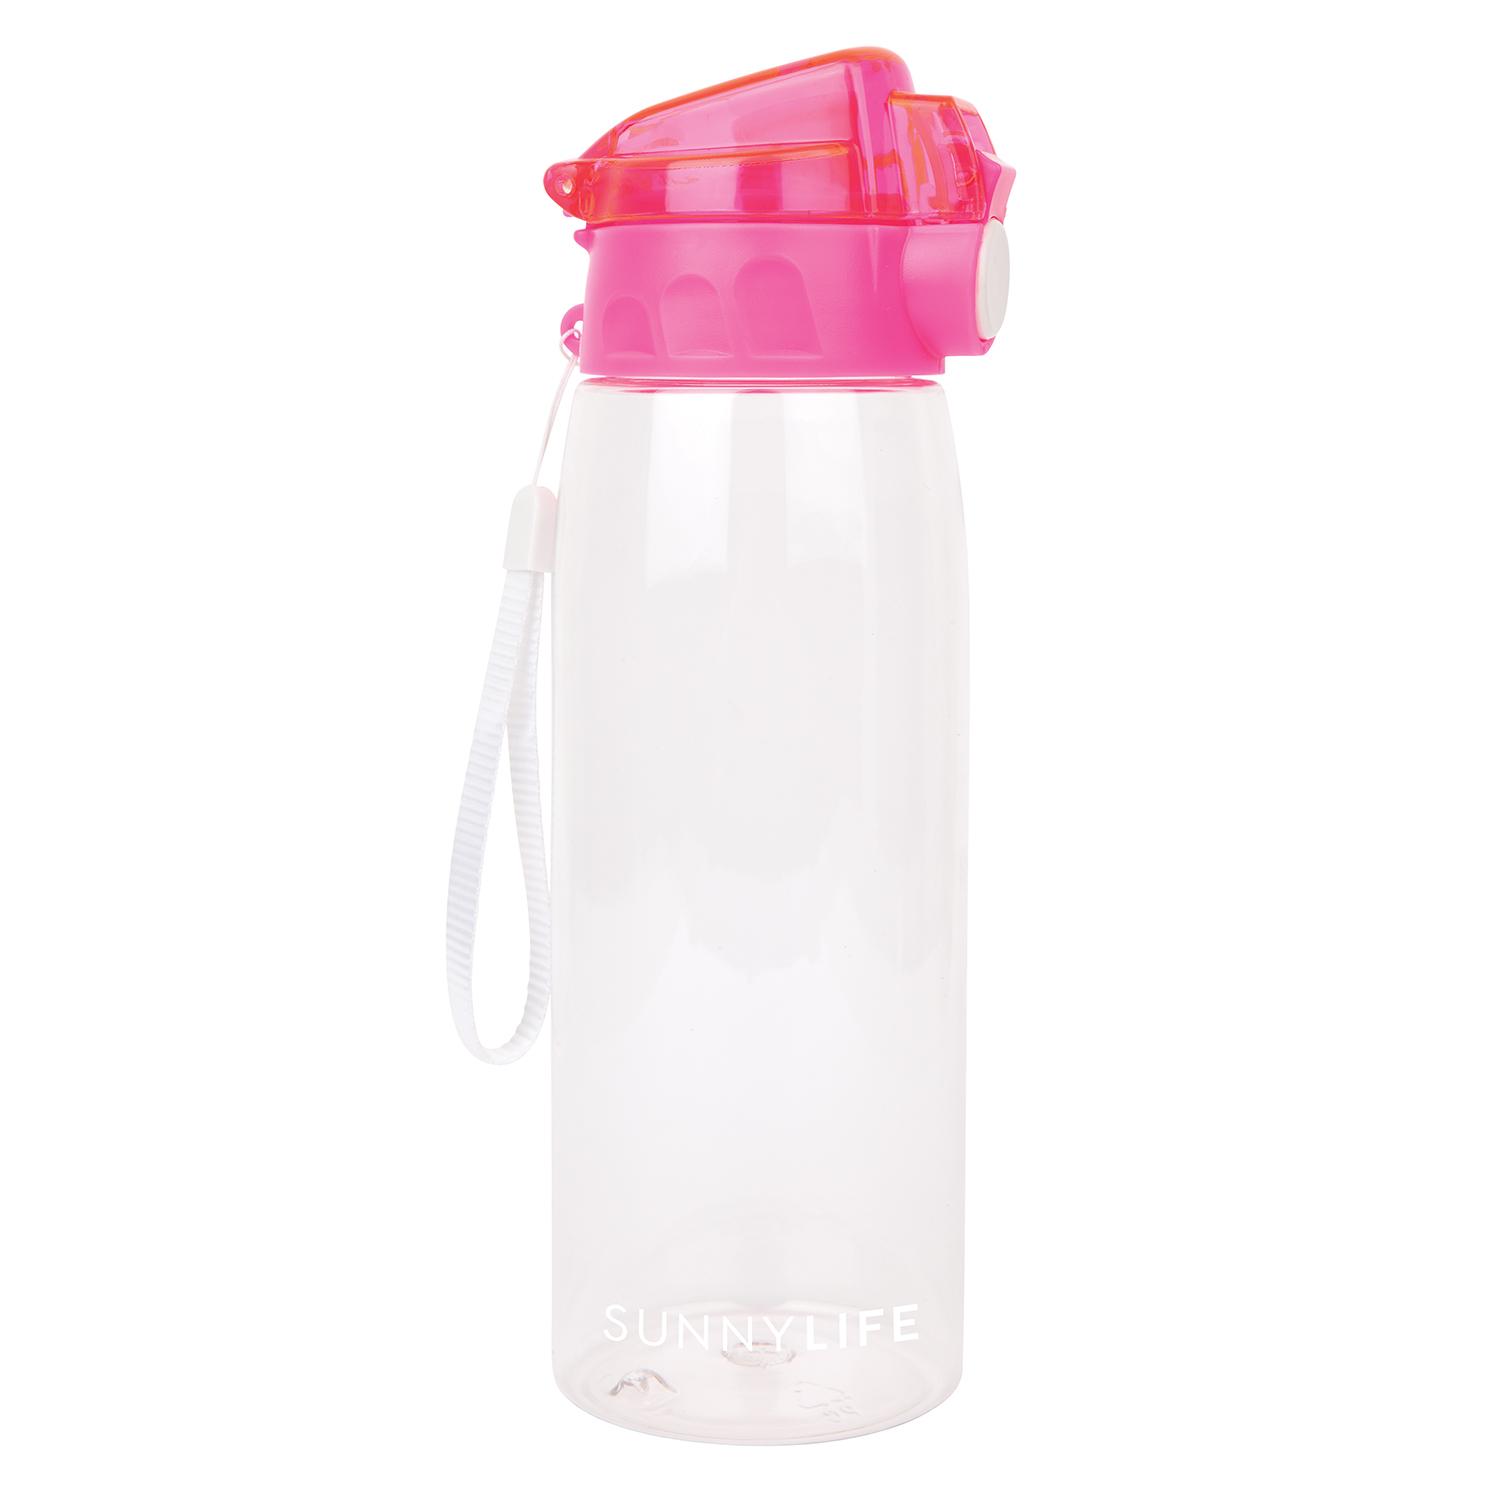 Sunnylife – Neon Pink 'Burn Baby Burn' Active Kit